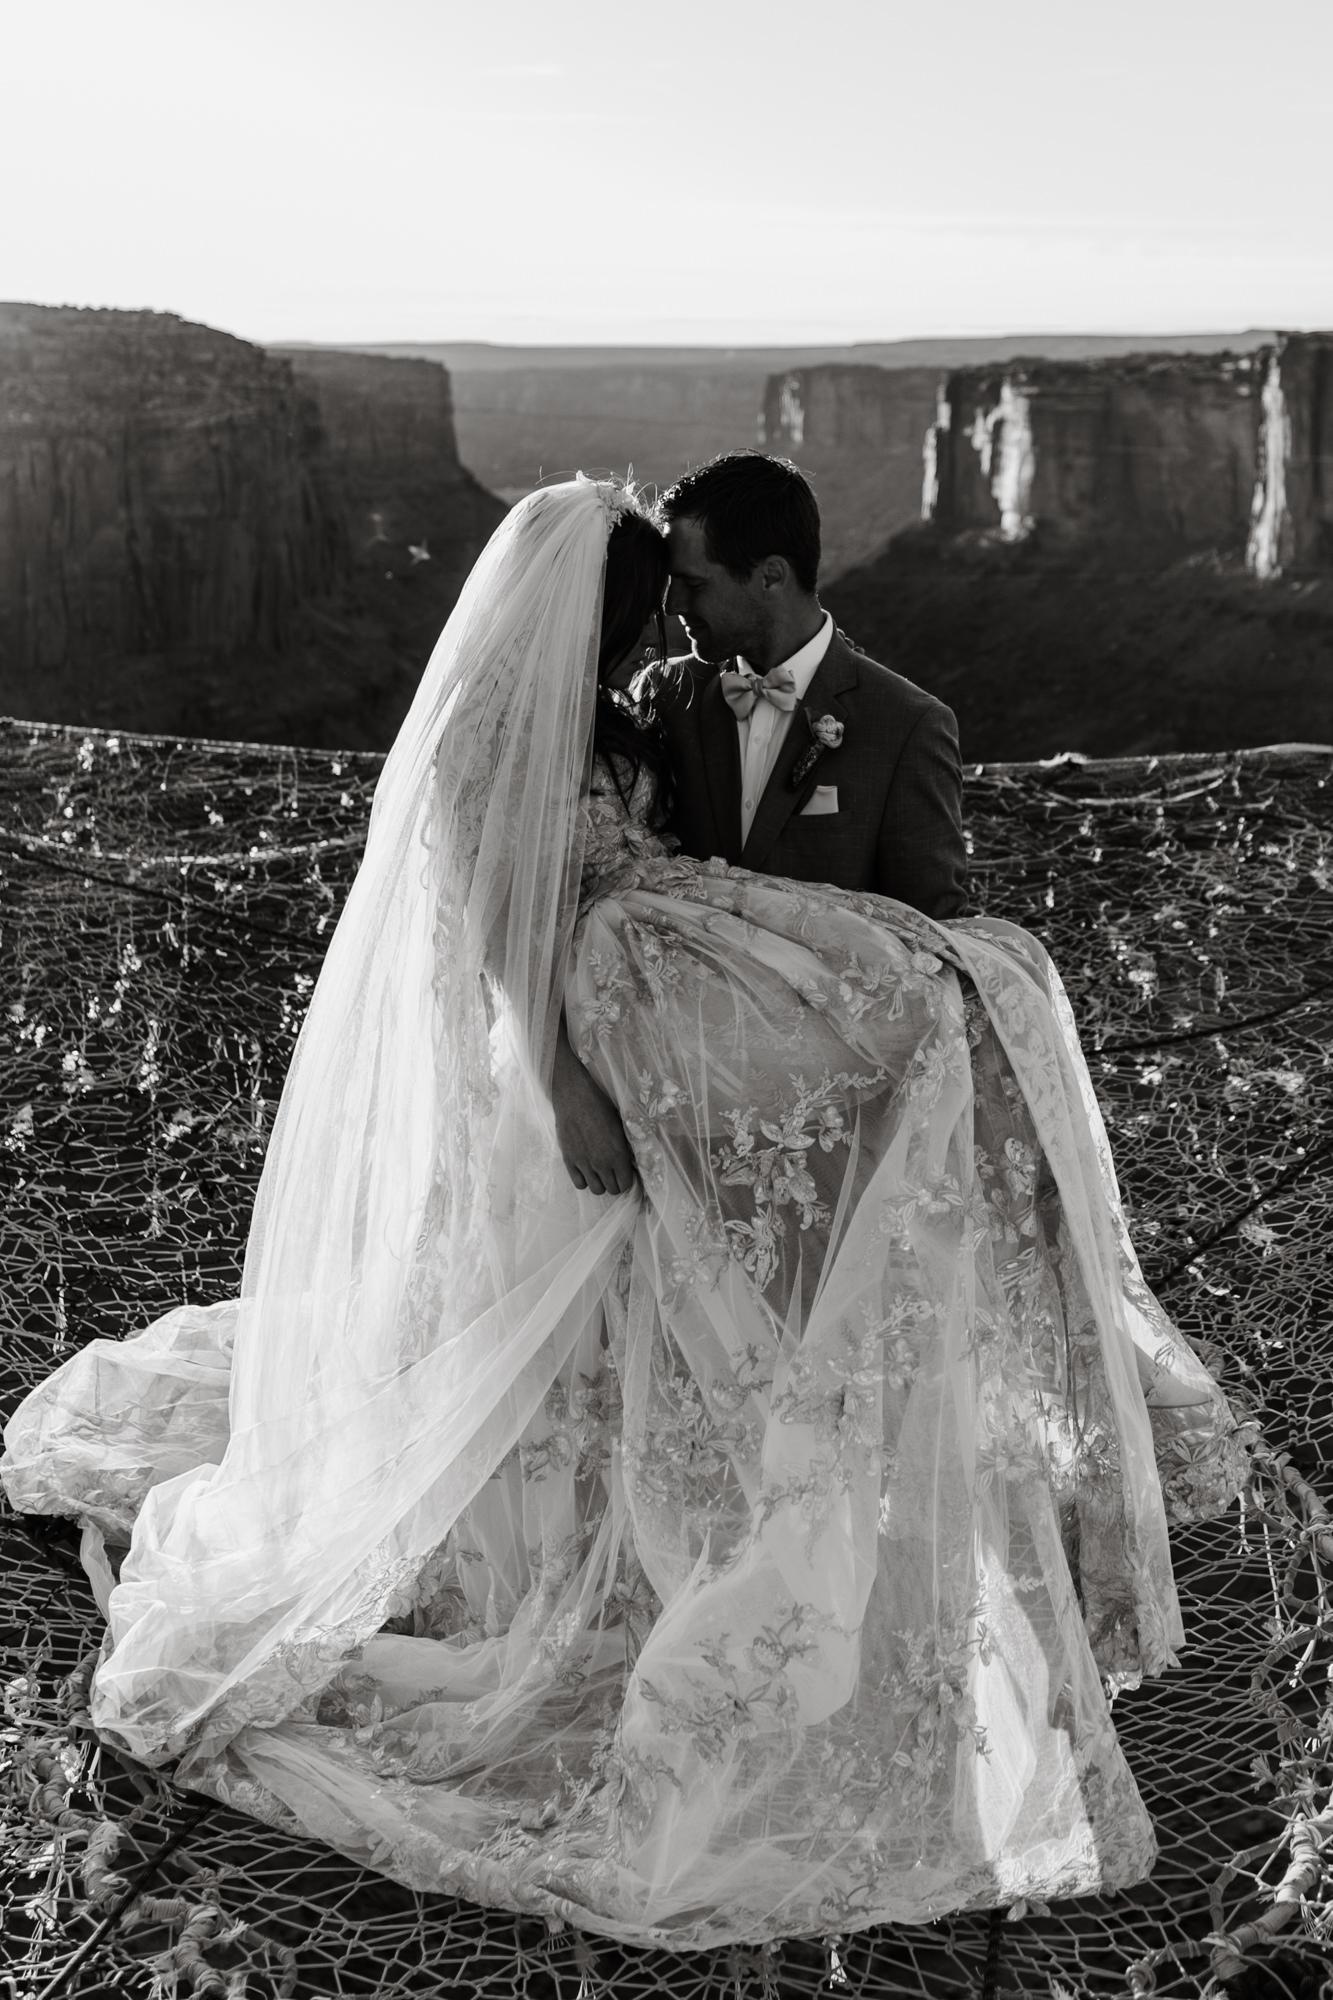 spacenet wedding 400 feet above a canyon in moab, utah | adventurous desert elopement | galia lahav bride | the hearnes adventure wedding photography | www.thehearnes.com